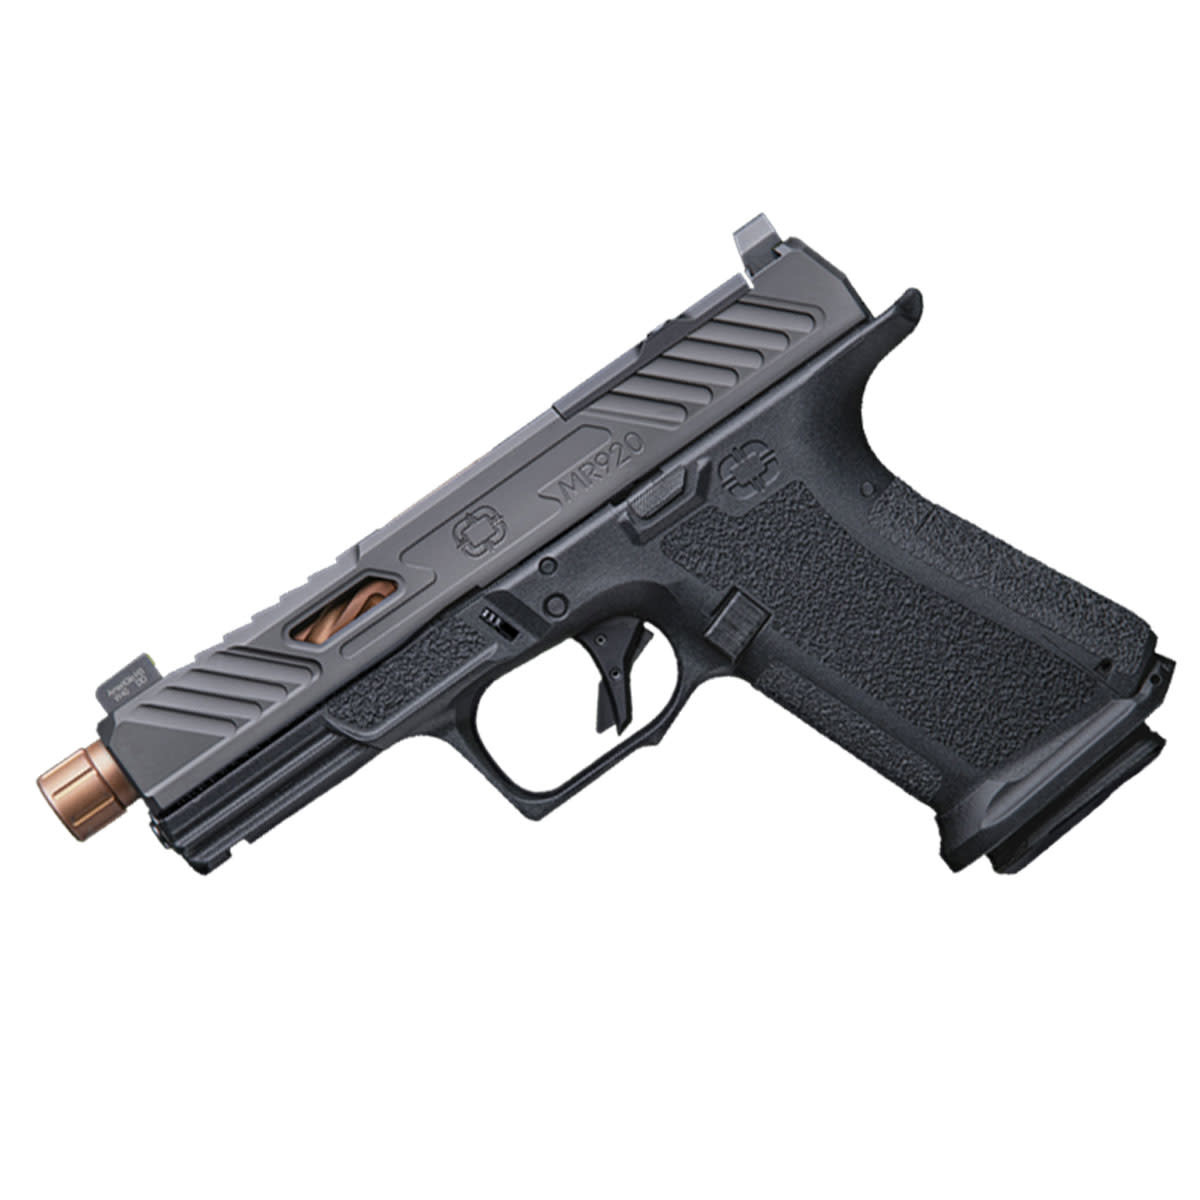 Shadow Systems MR290 Elite, 9mm, Black Frame, DLC slide with optics cut, Spiral Threaded Barrel Bronze, SS Rod, Green Tritium Front Sight, w/ Glock 19 magwell